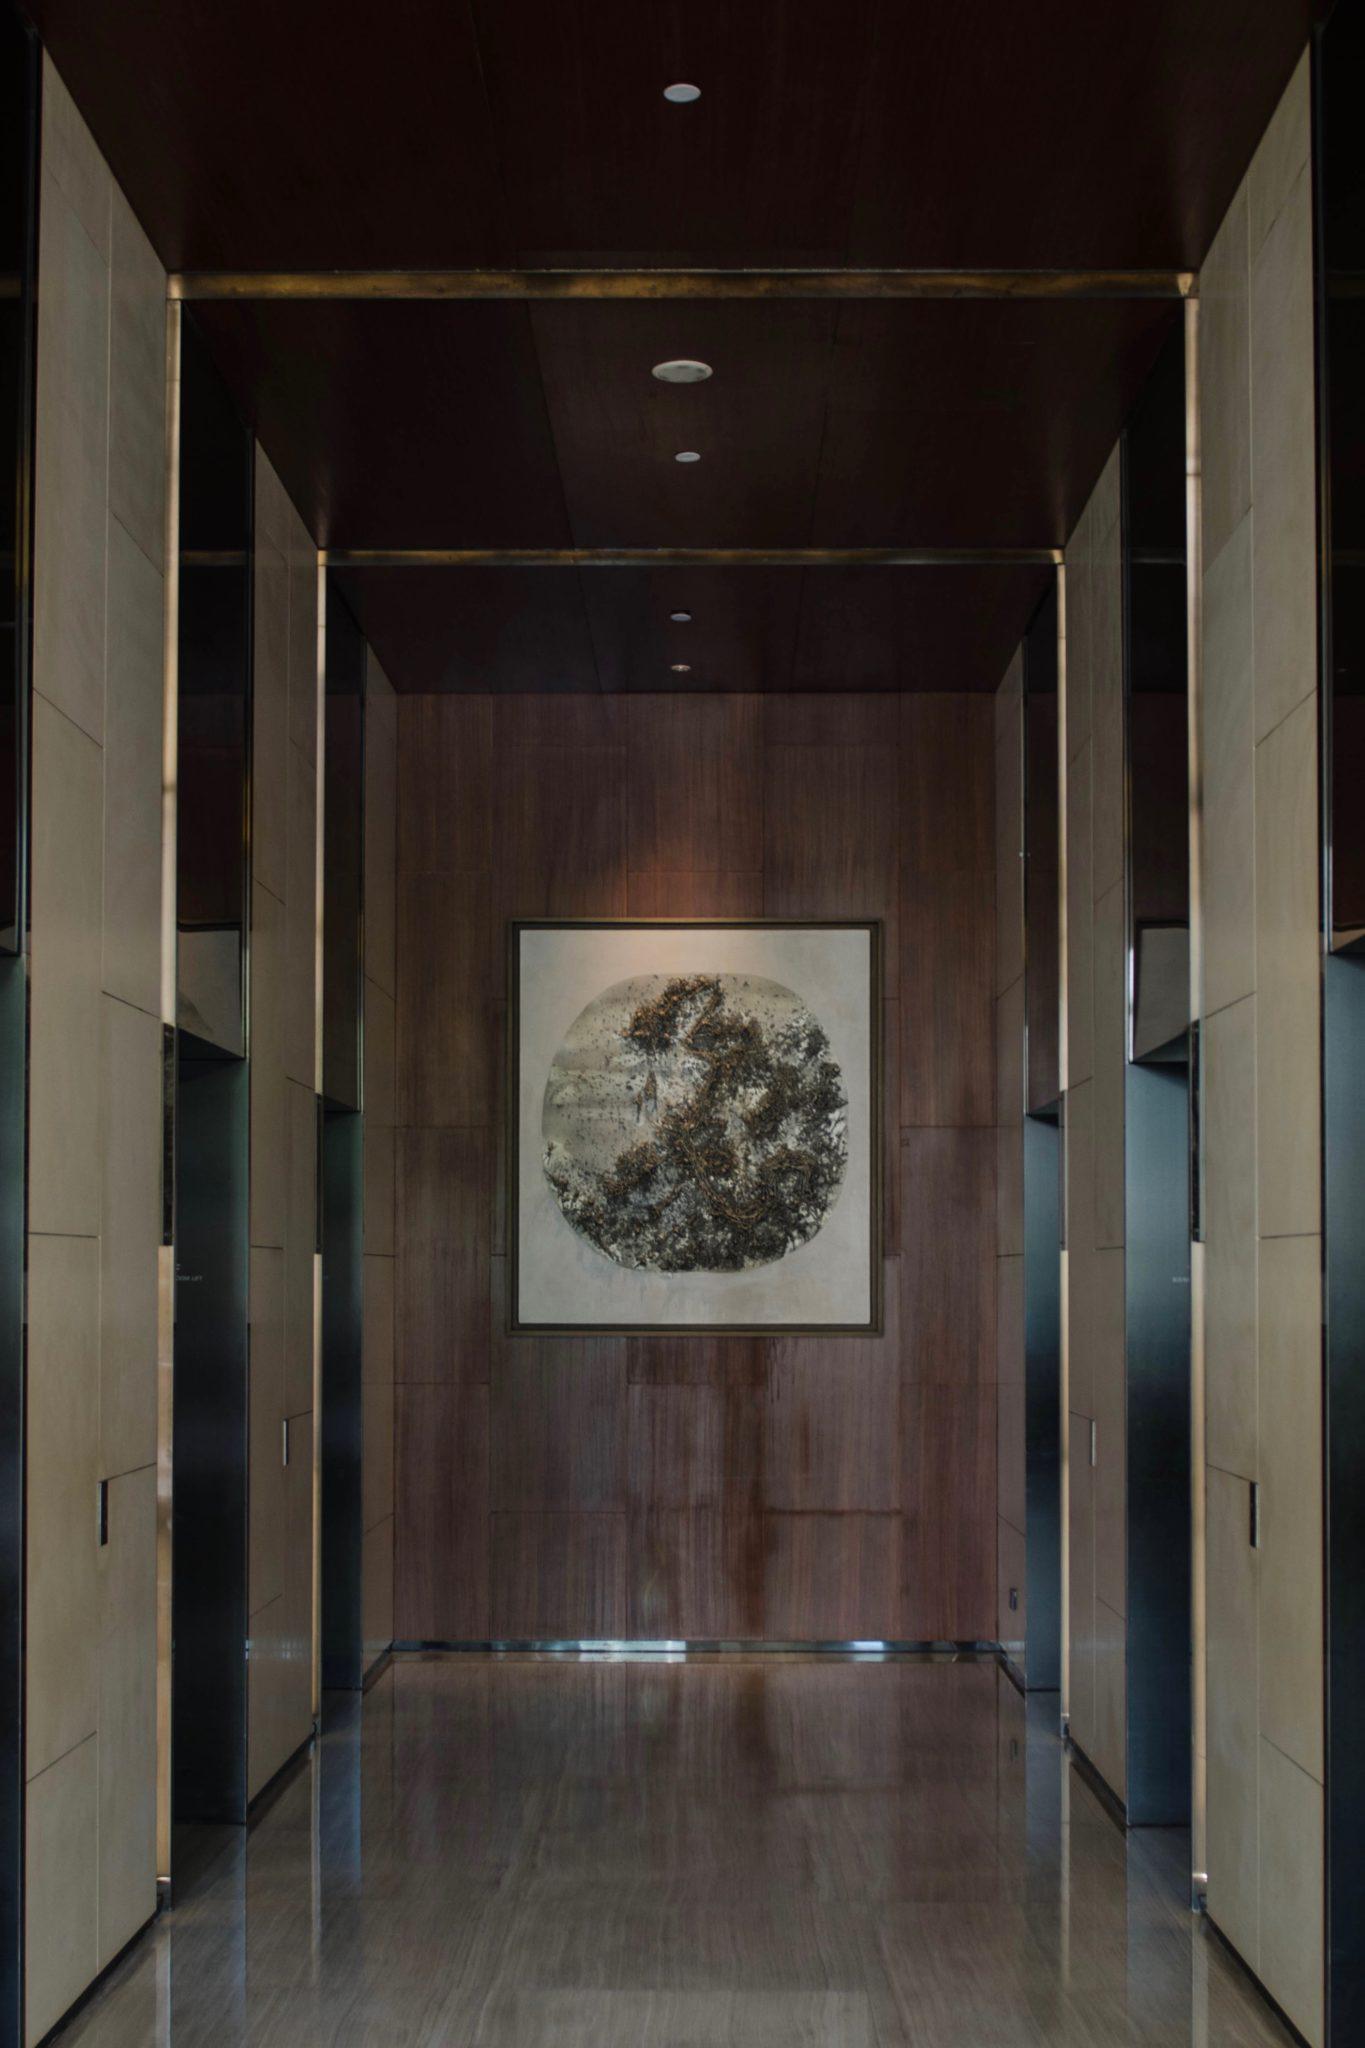 EAST Hotel Peking: Die Kunstwerke sind immer gut positioniert